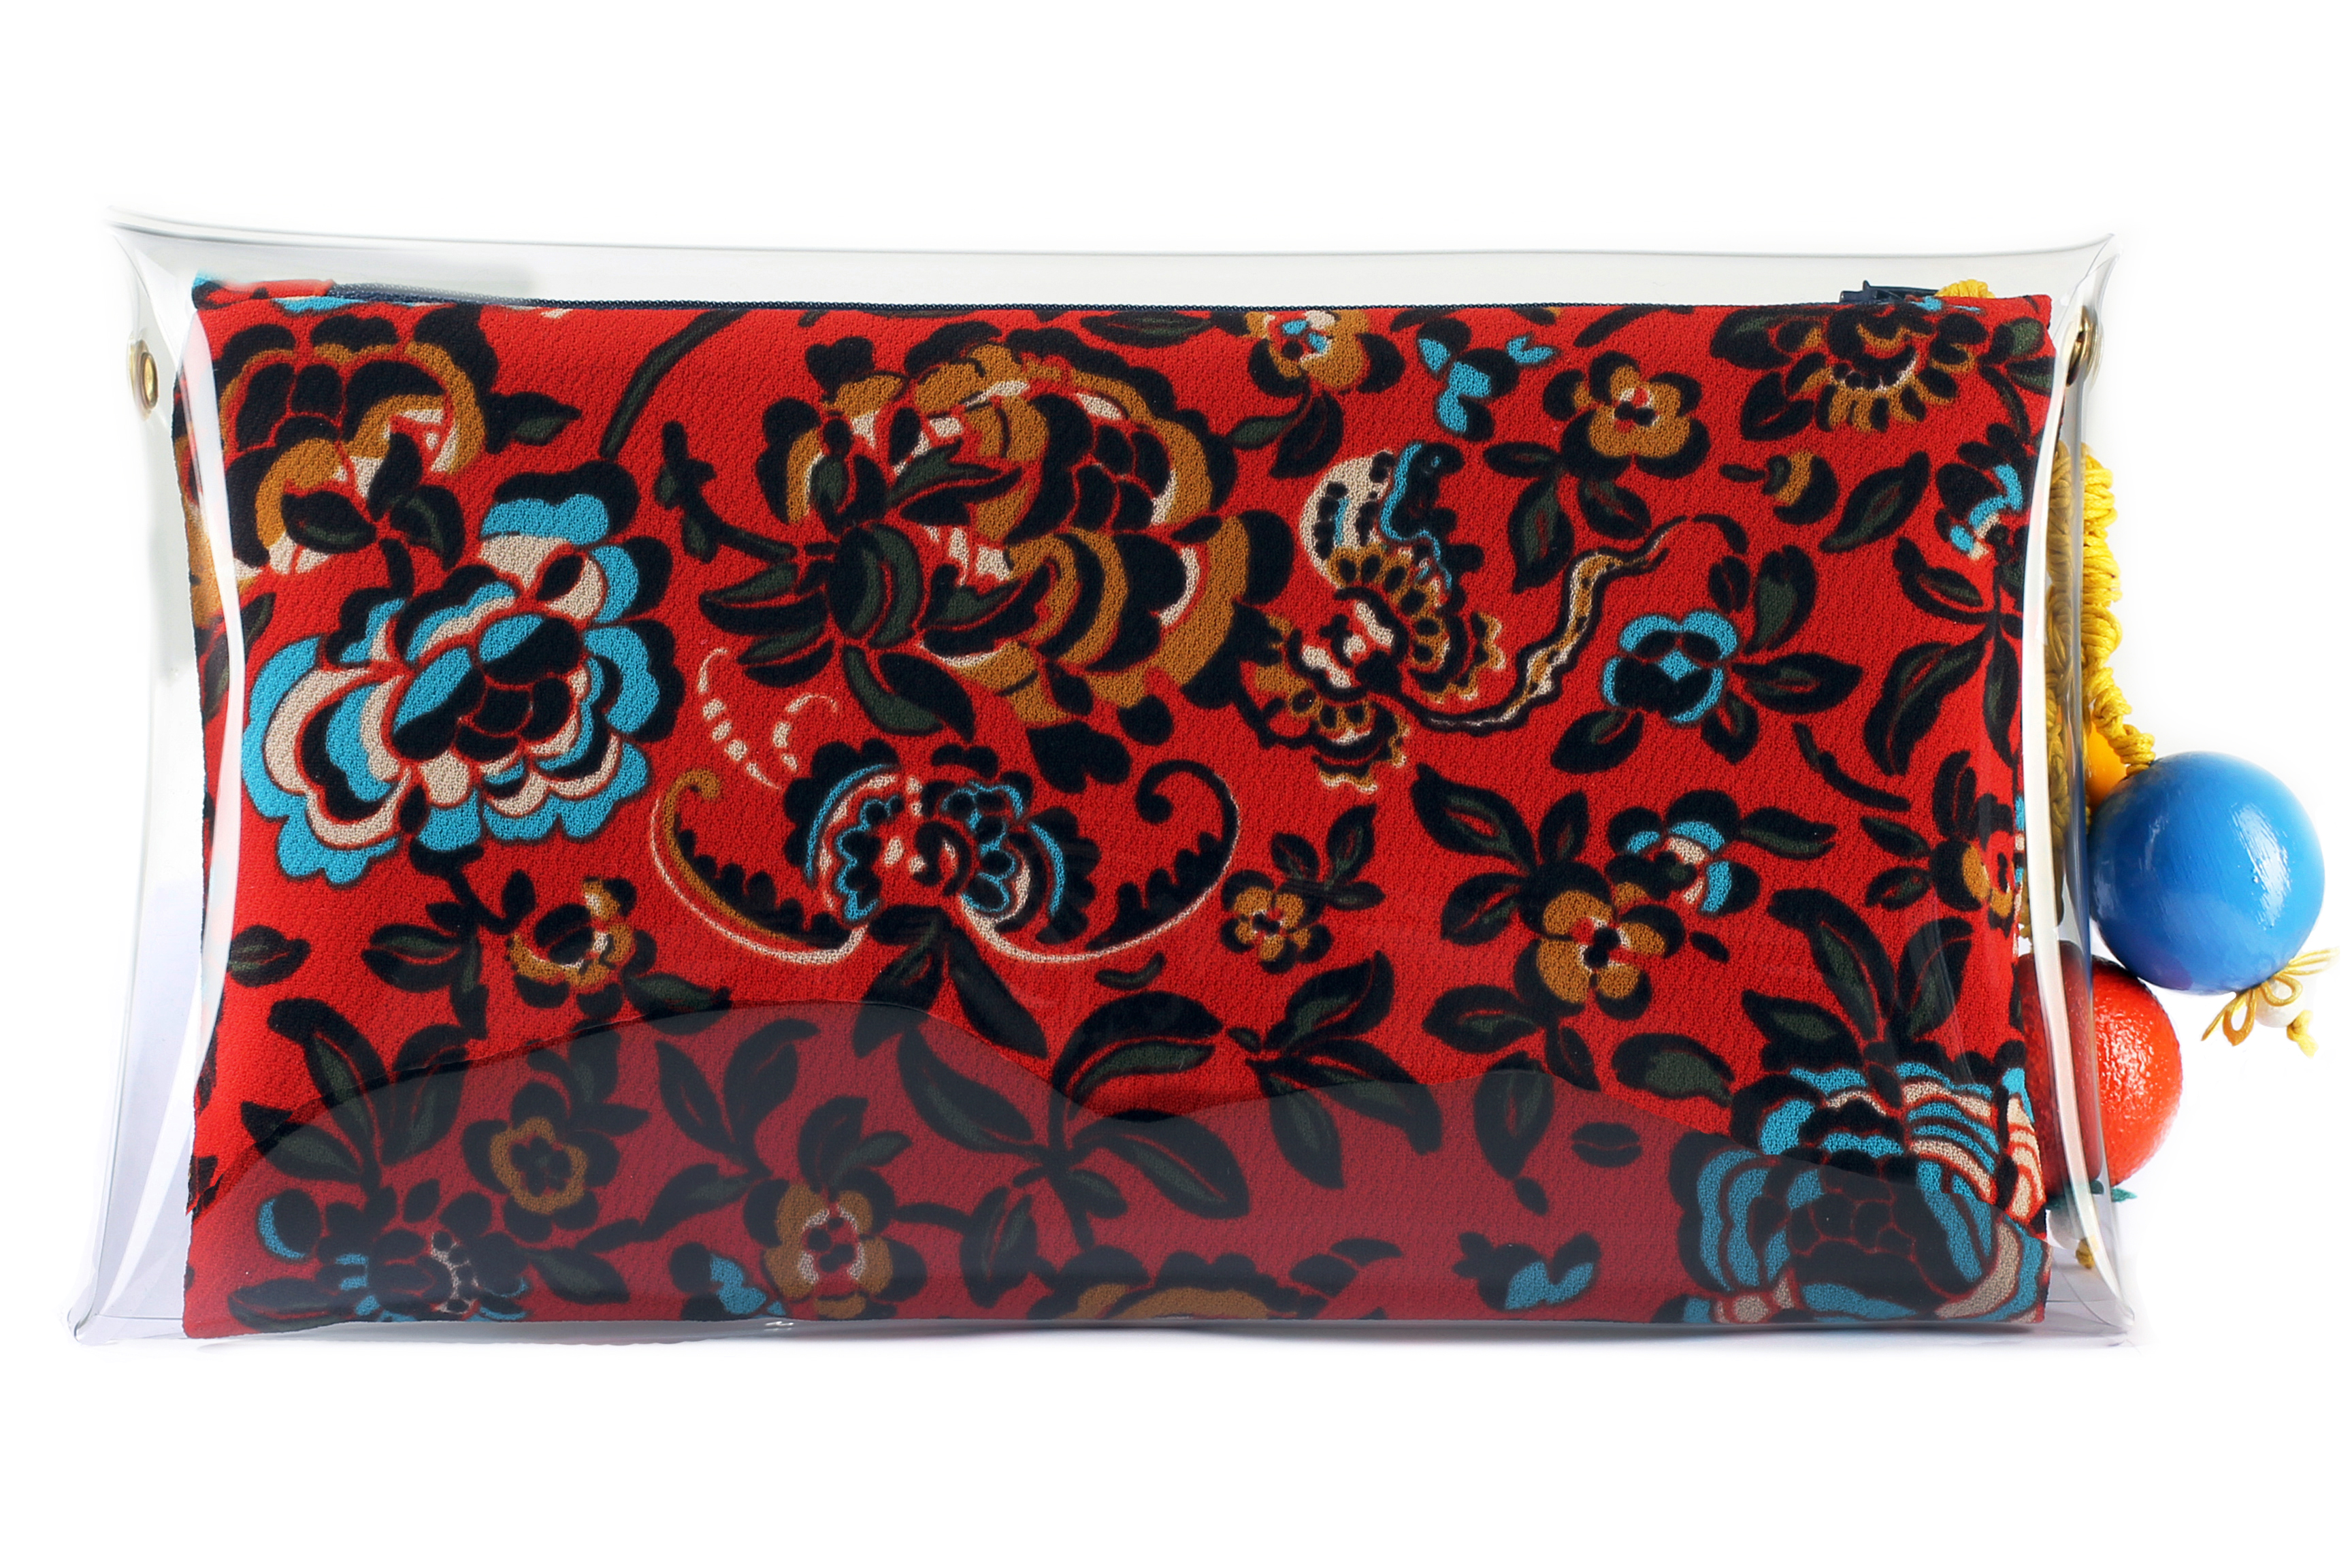 Handbags – Red Poison – Summer Clutch Bags 2017 4